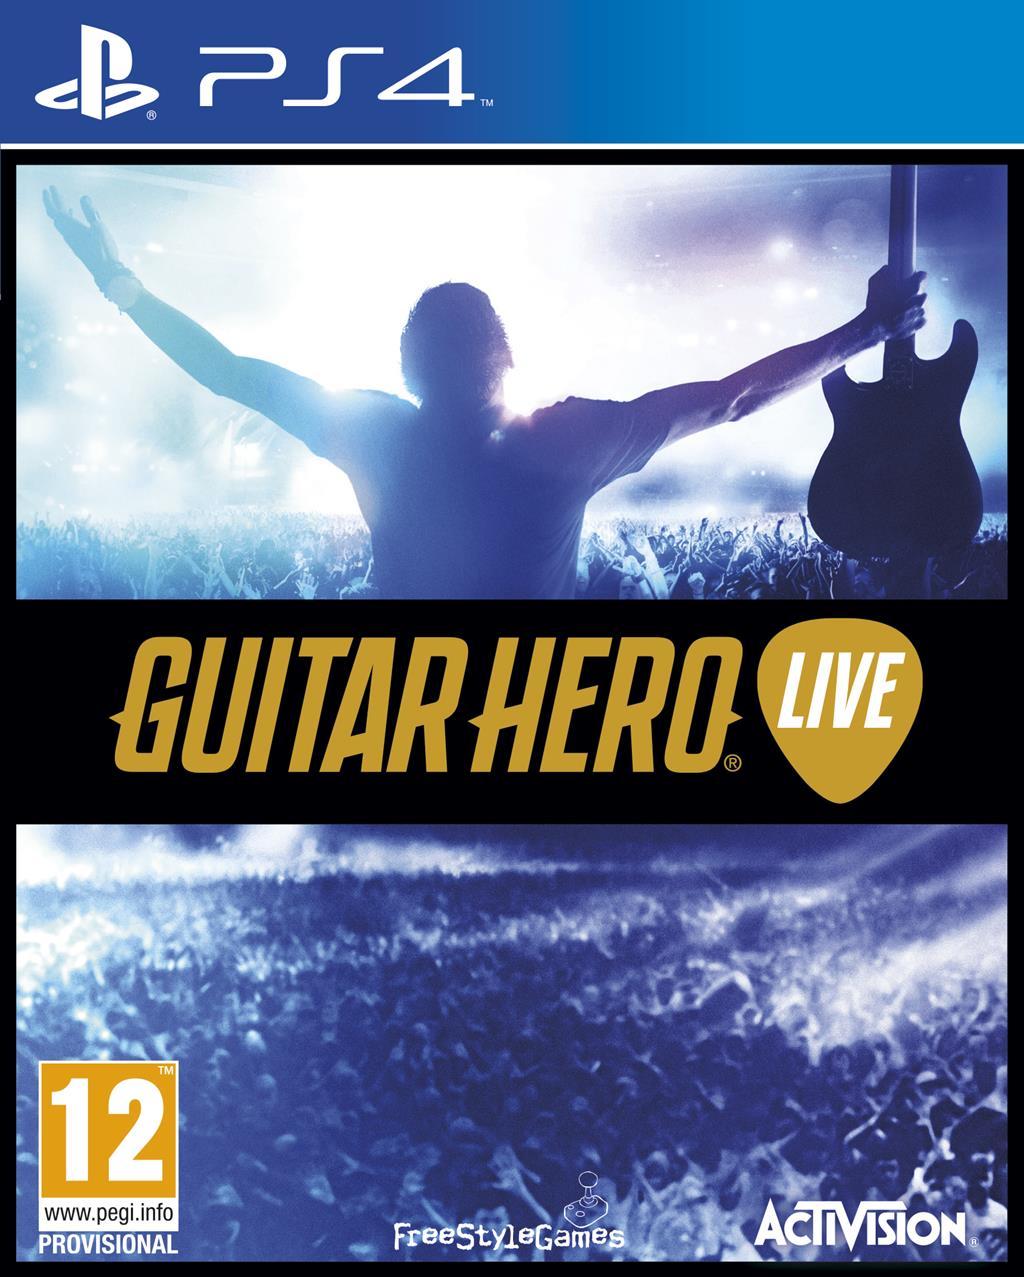 Guitar Hero Live (Video Game 2015) - IMDb